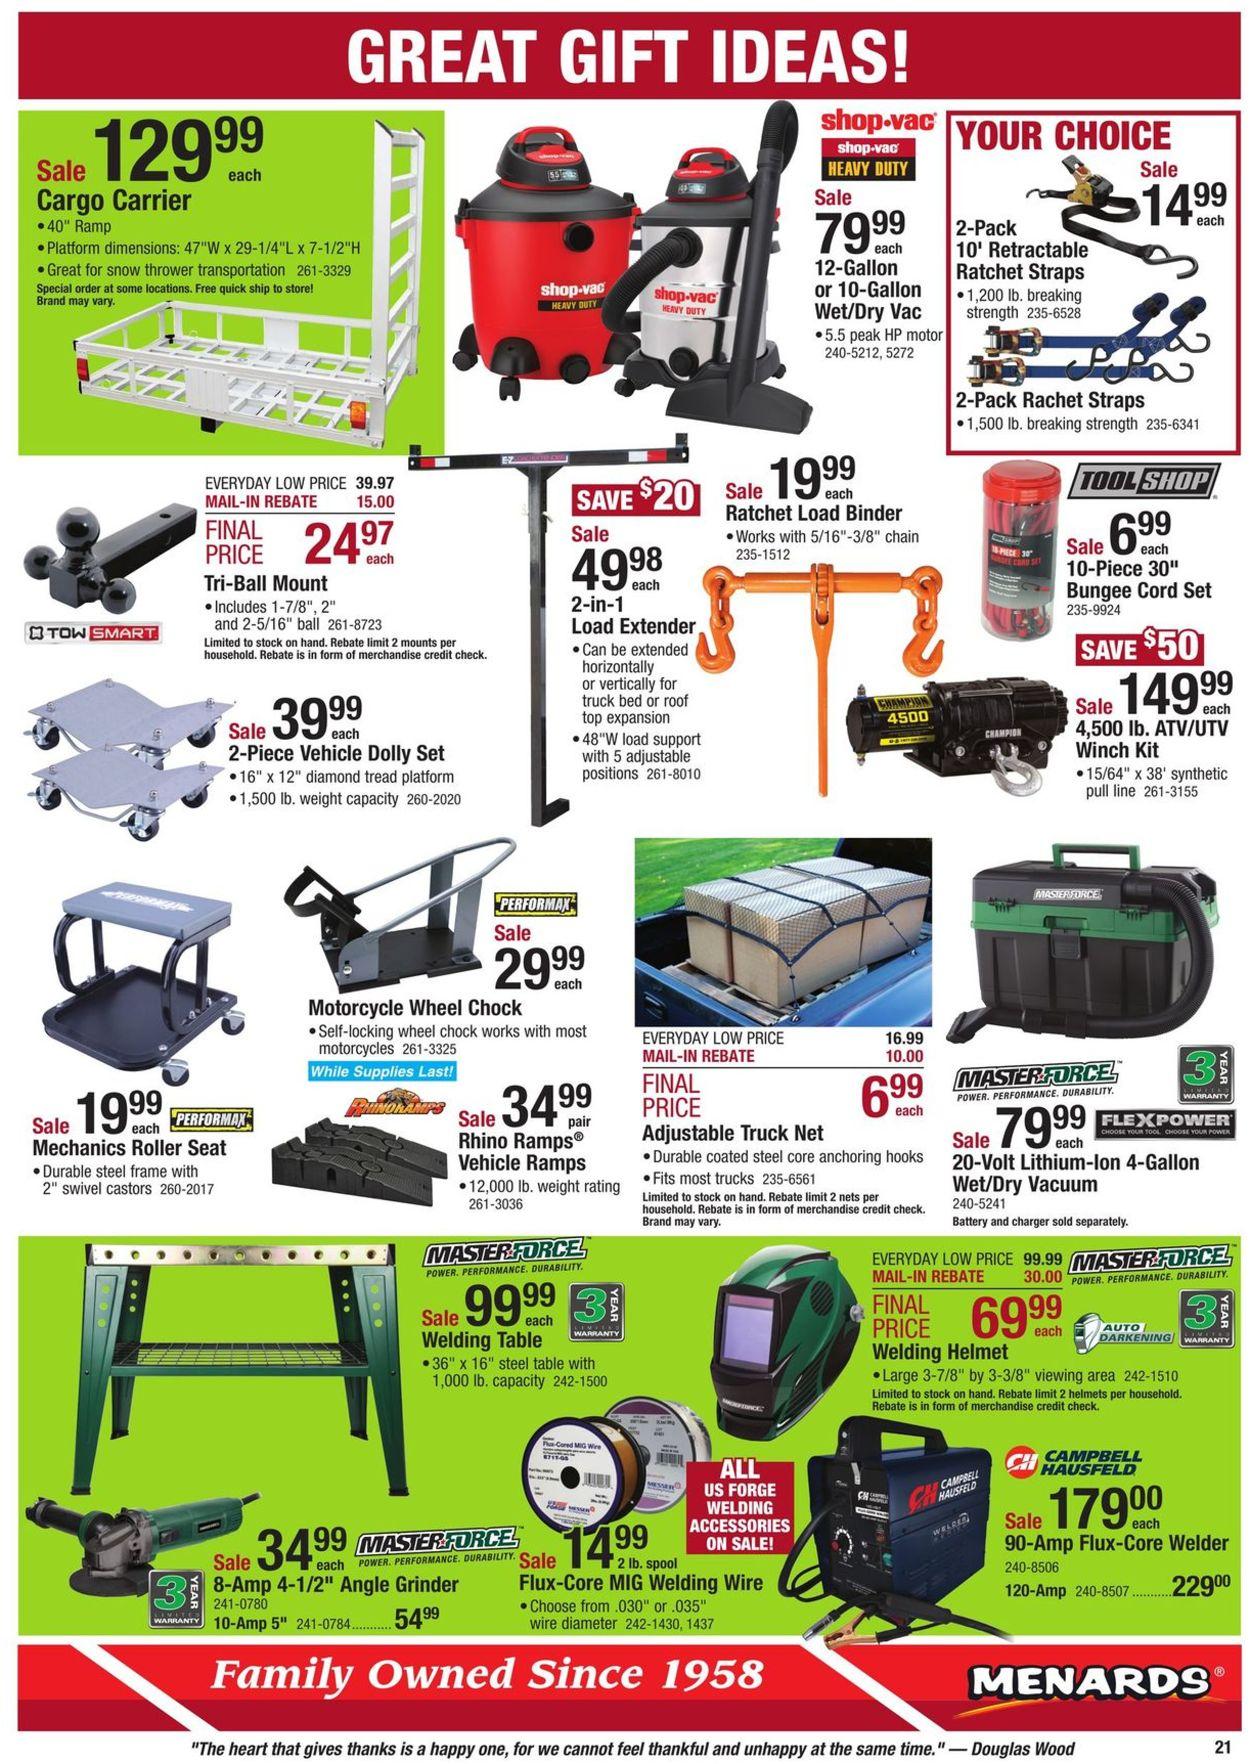 Menards Christmas Catalog 2020 Menards   Christmas Ad 2019 Current weekly ad 11/24   12/07/2019